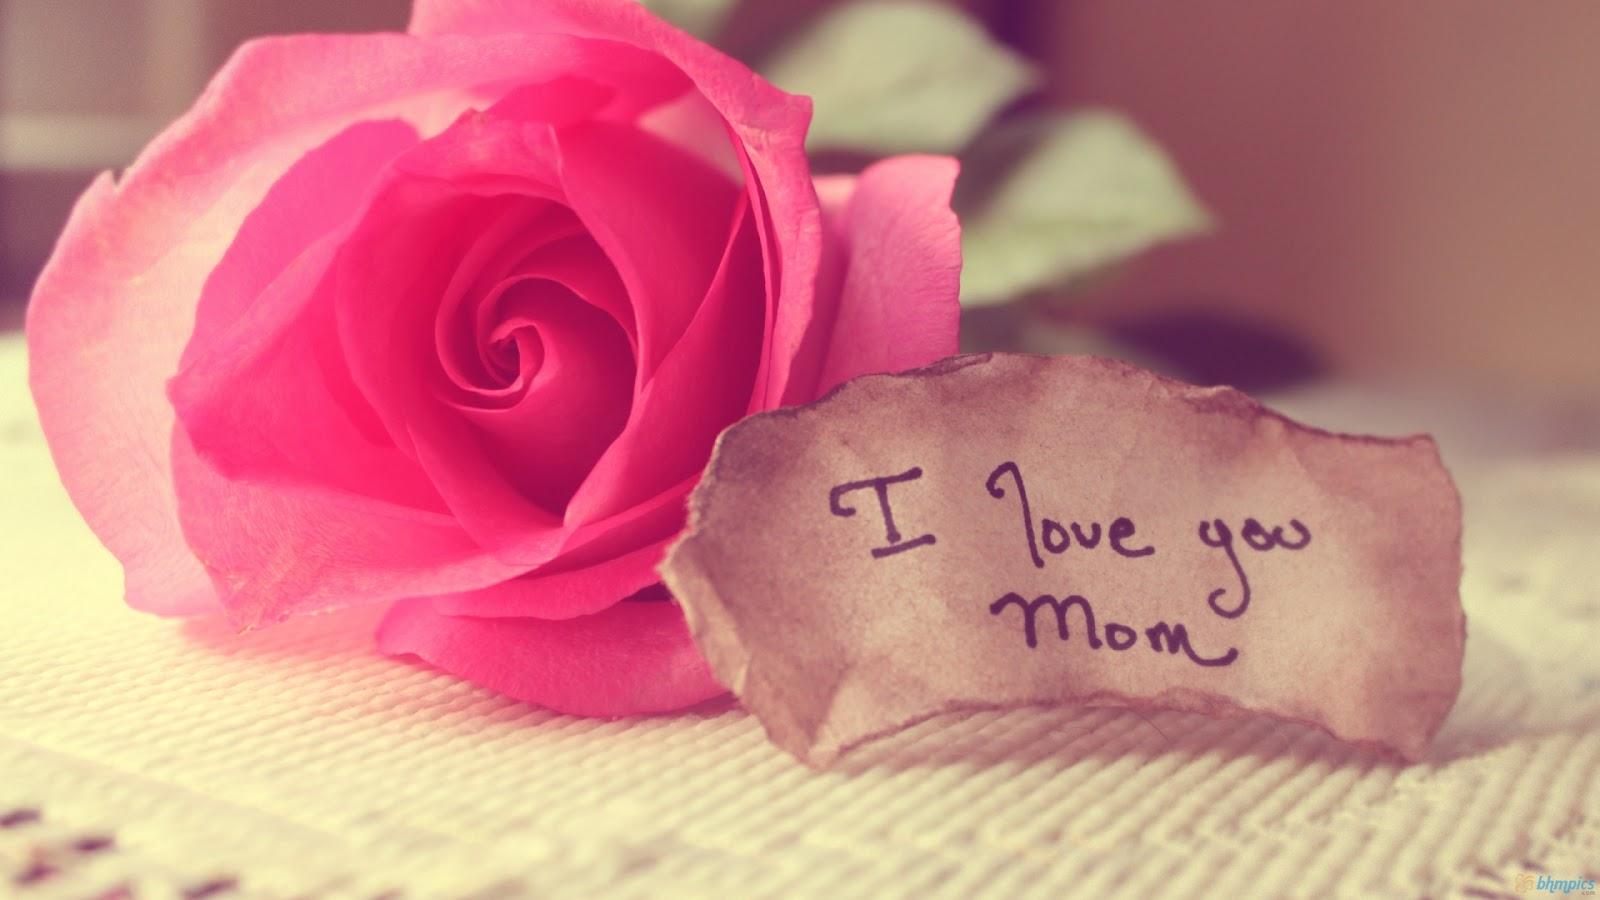 Puisi Indah Ibu Kita Tercinta 2017 Coretan Tinta Memang Selama